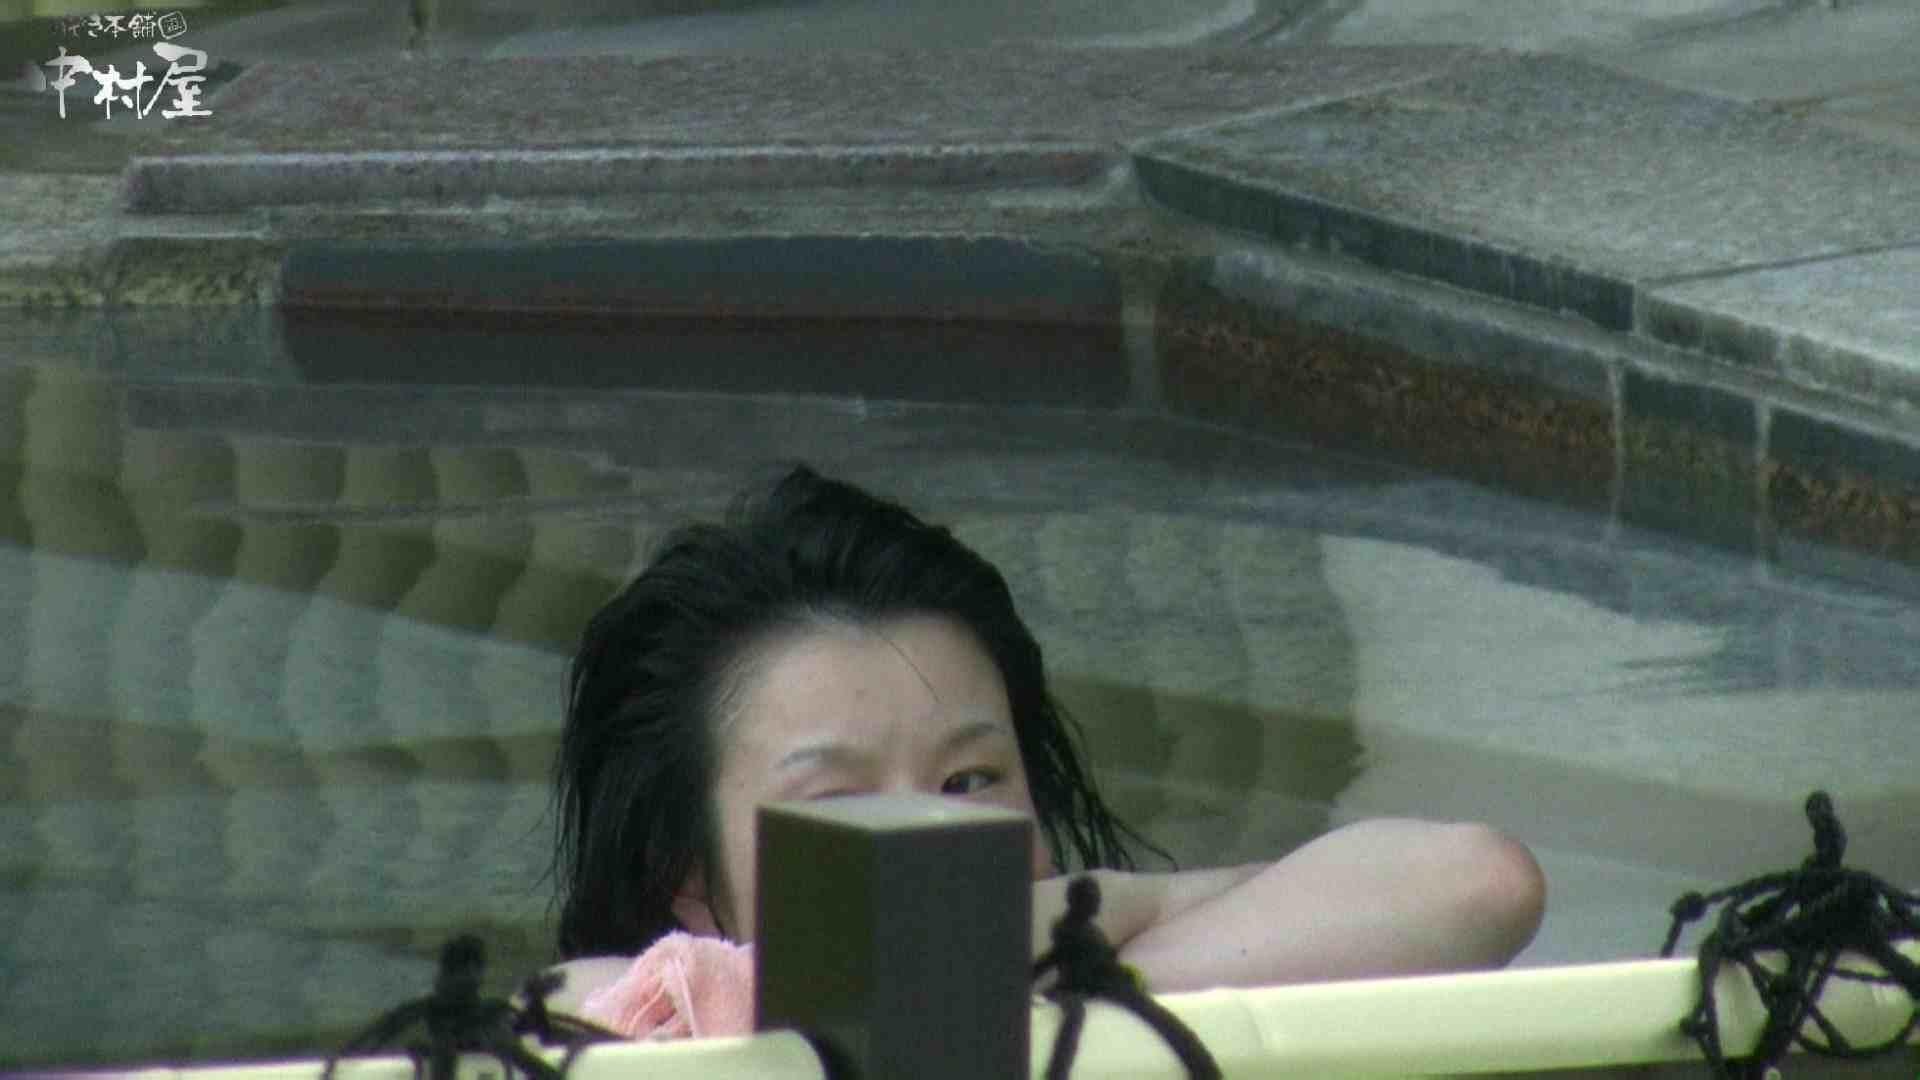 Aquaな露天風呂Vol.982 露天風呂突入 SEX無修正画像 78pic 14